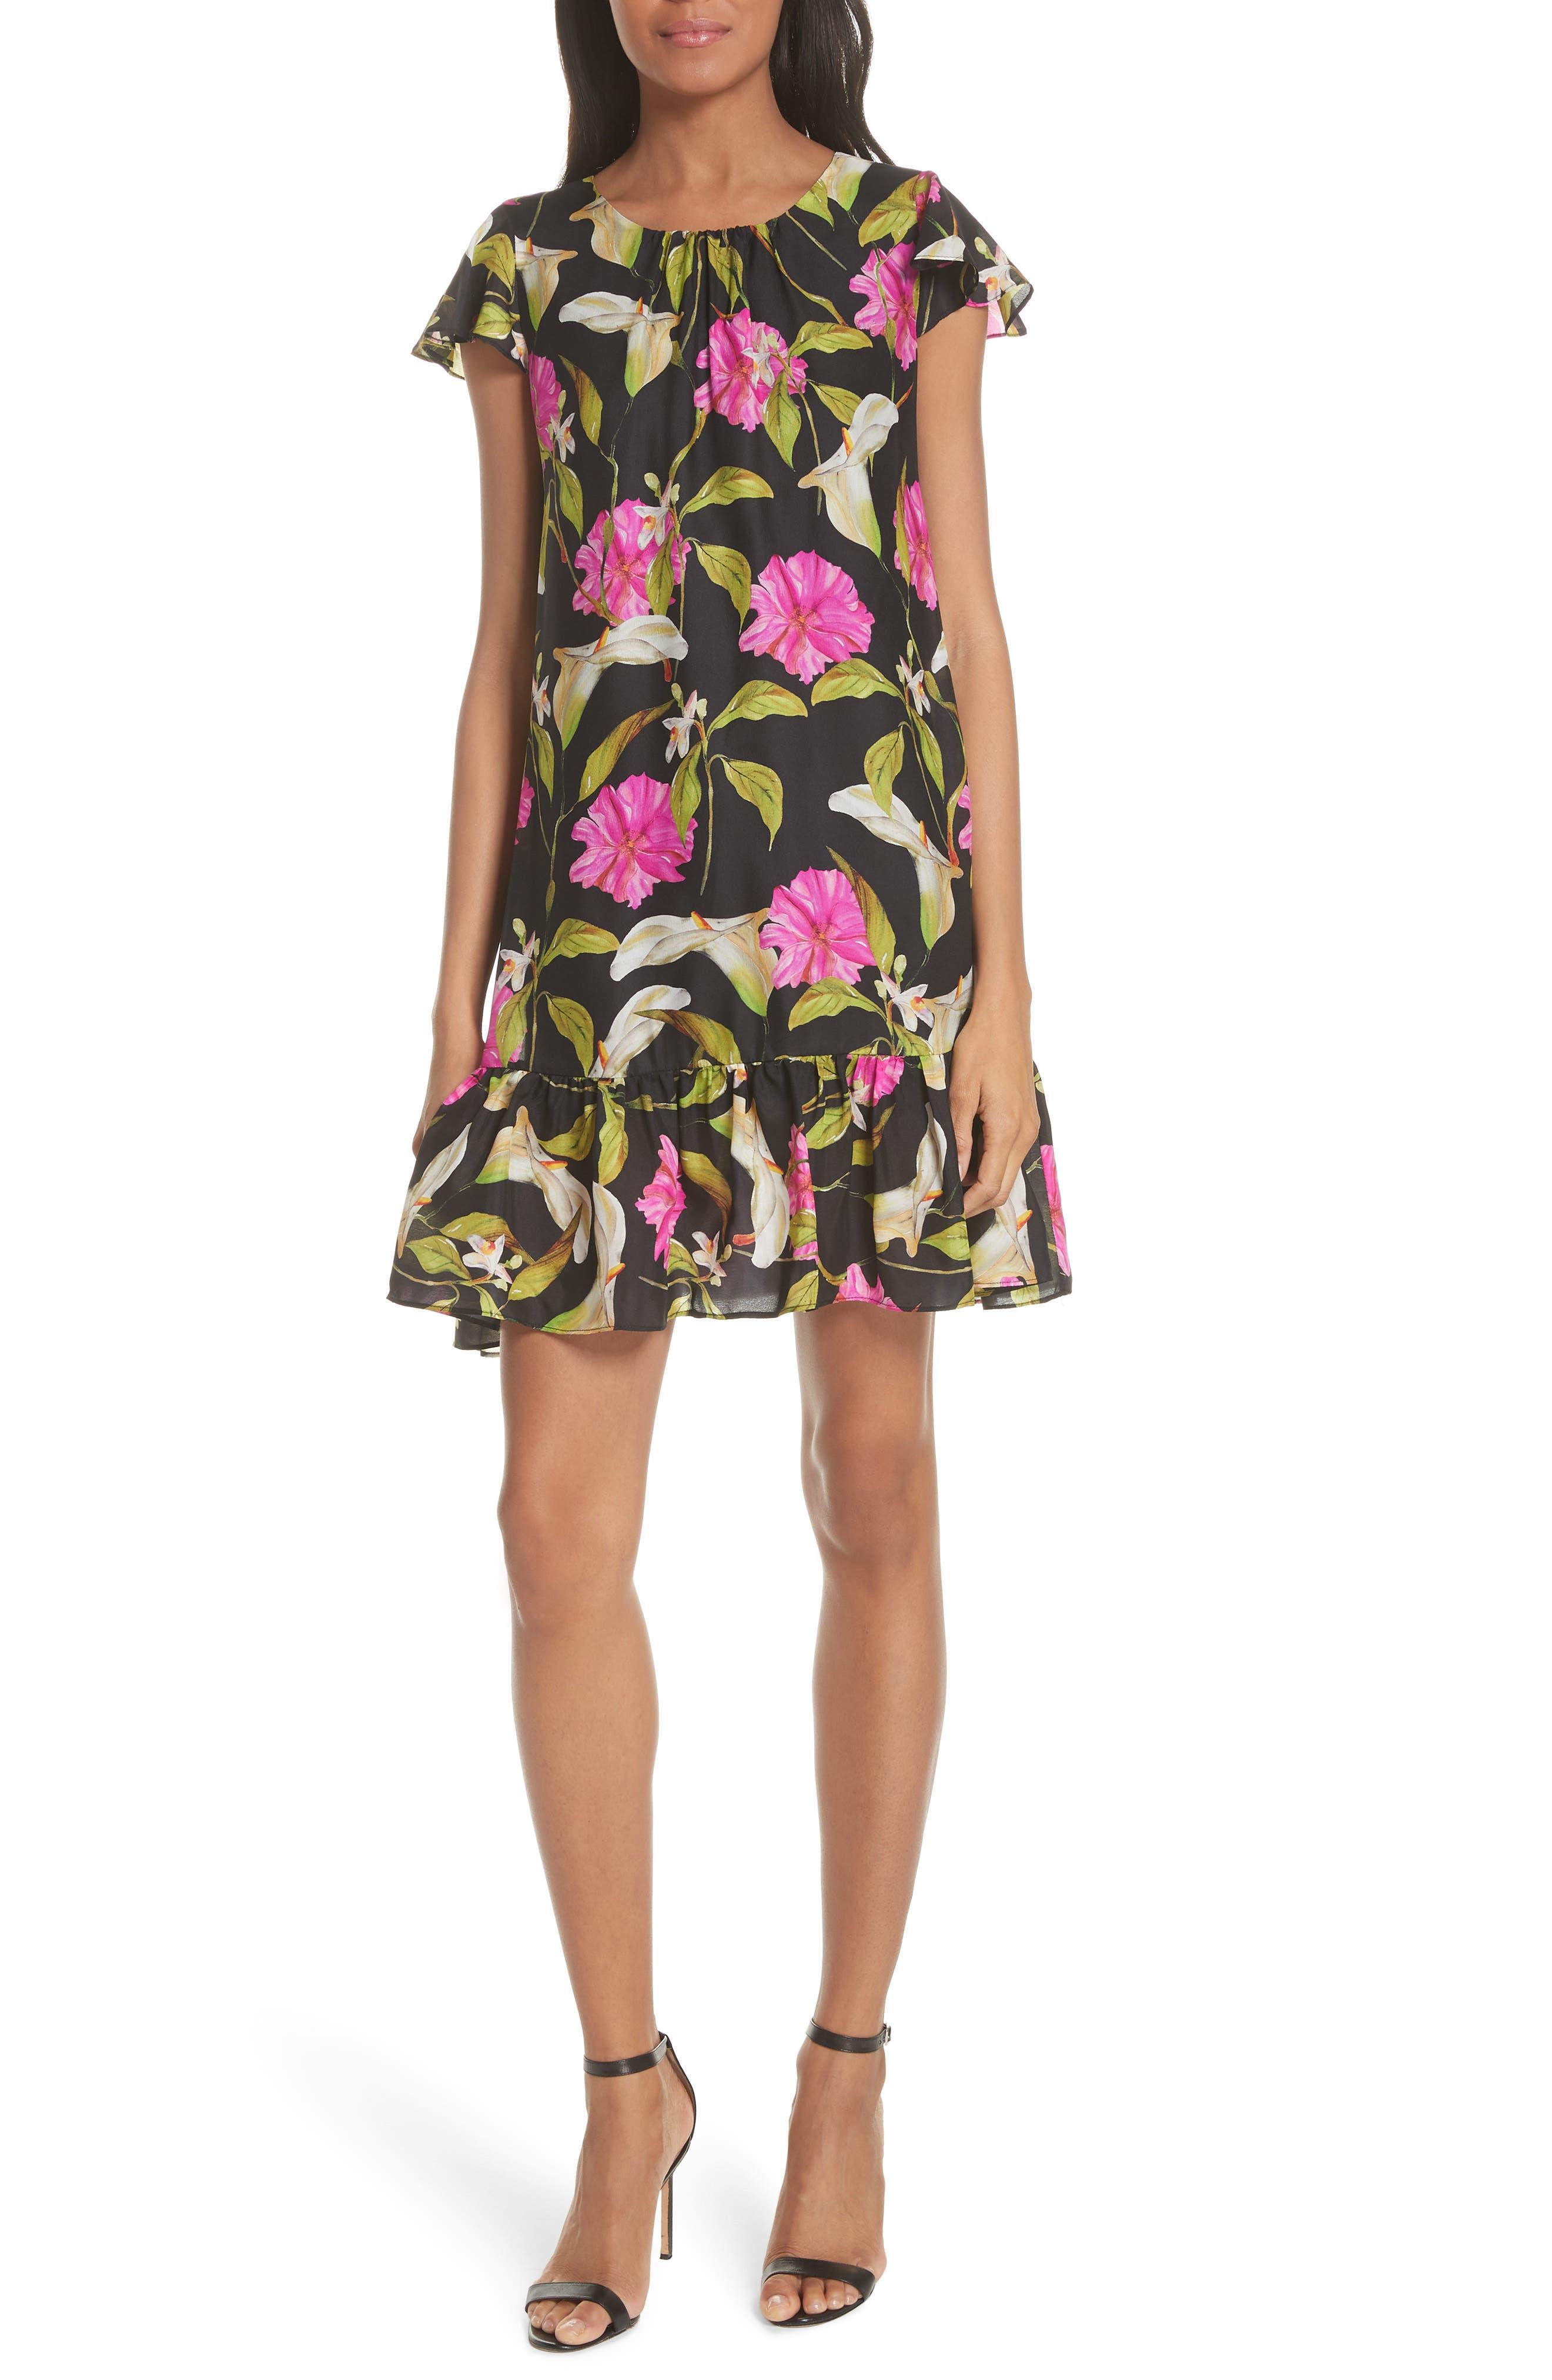 Jill Large Calla Lily Shift Dress,                             Main thumbnail 1, color,                             Multi